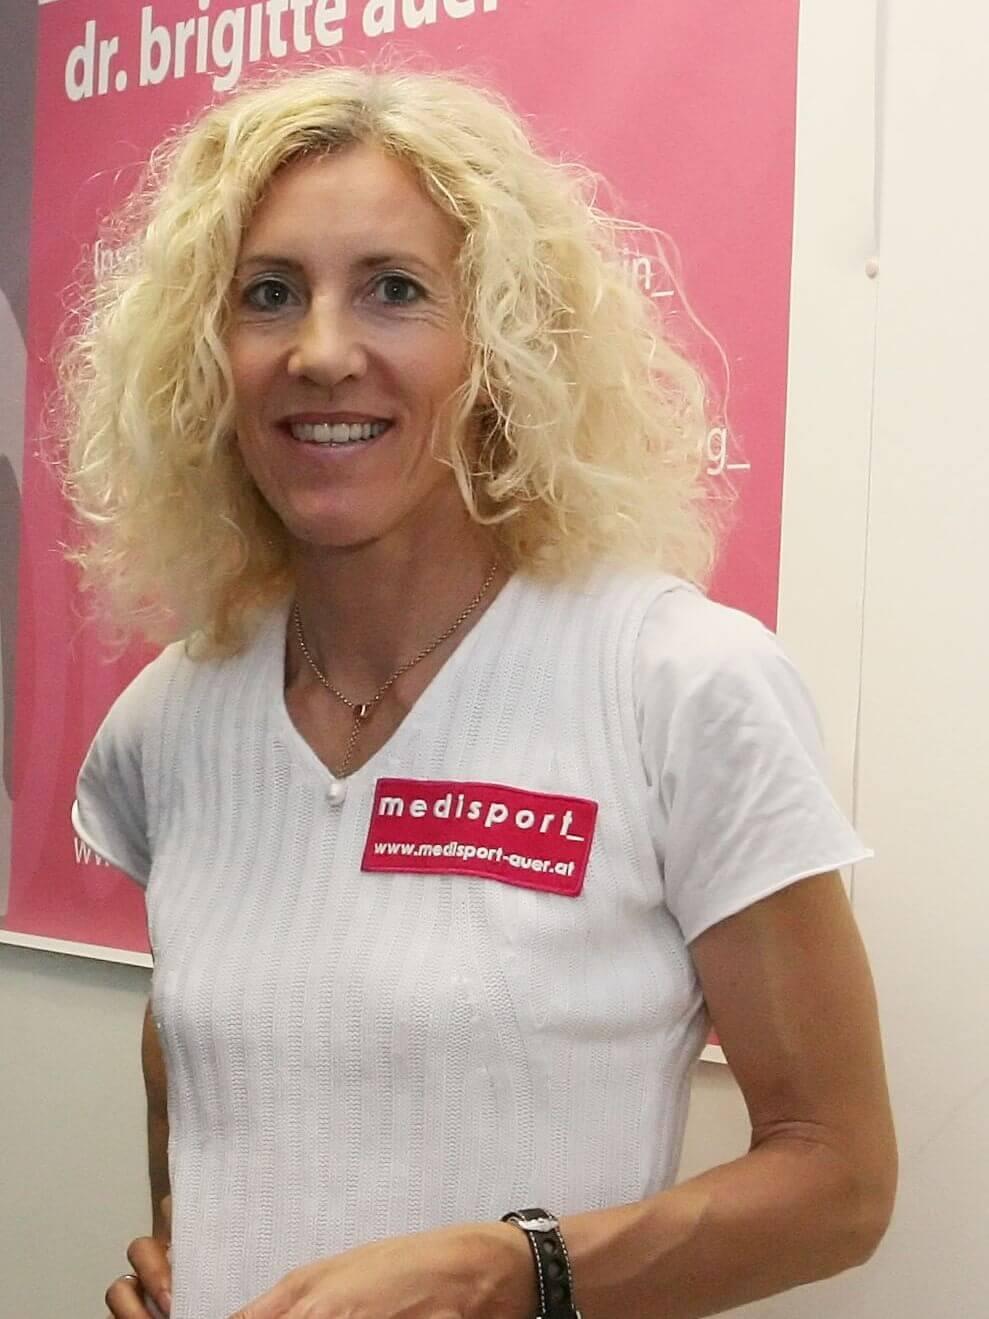 Dr. Brigitte Auer